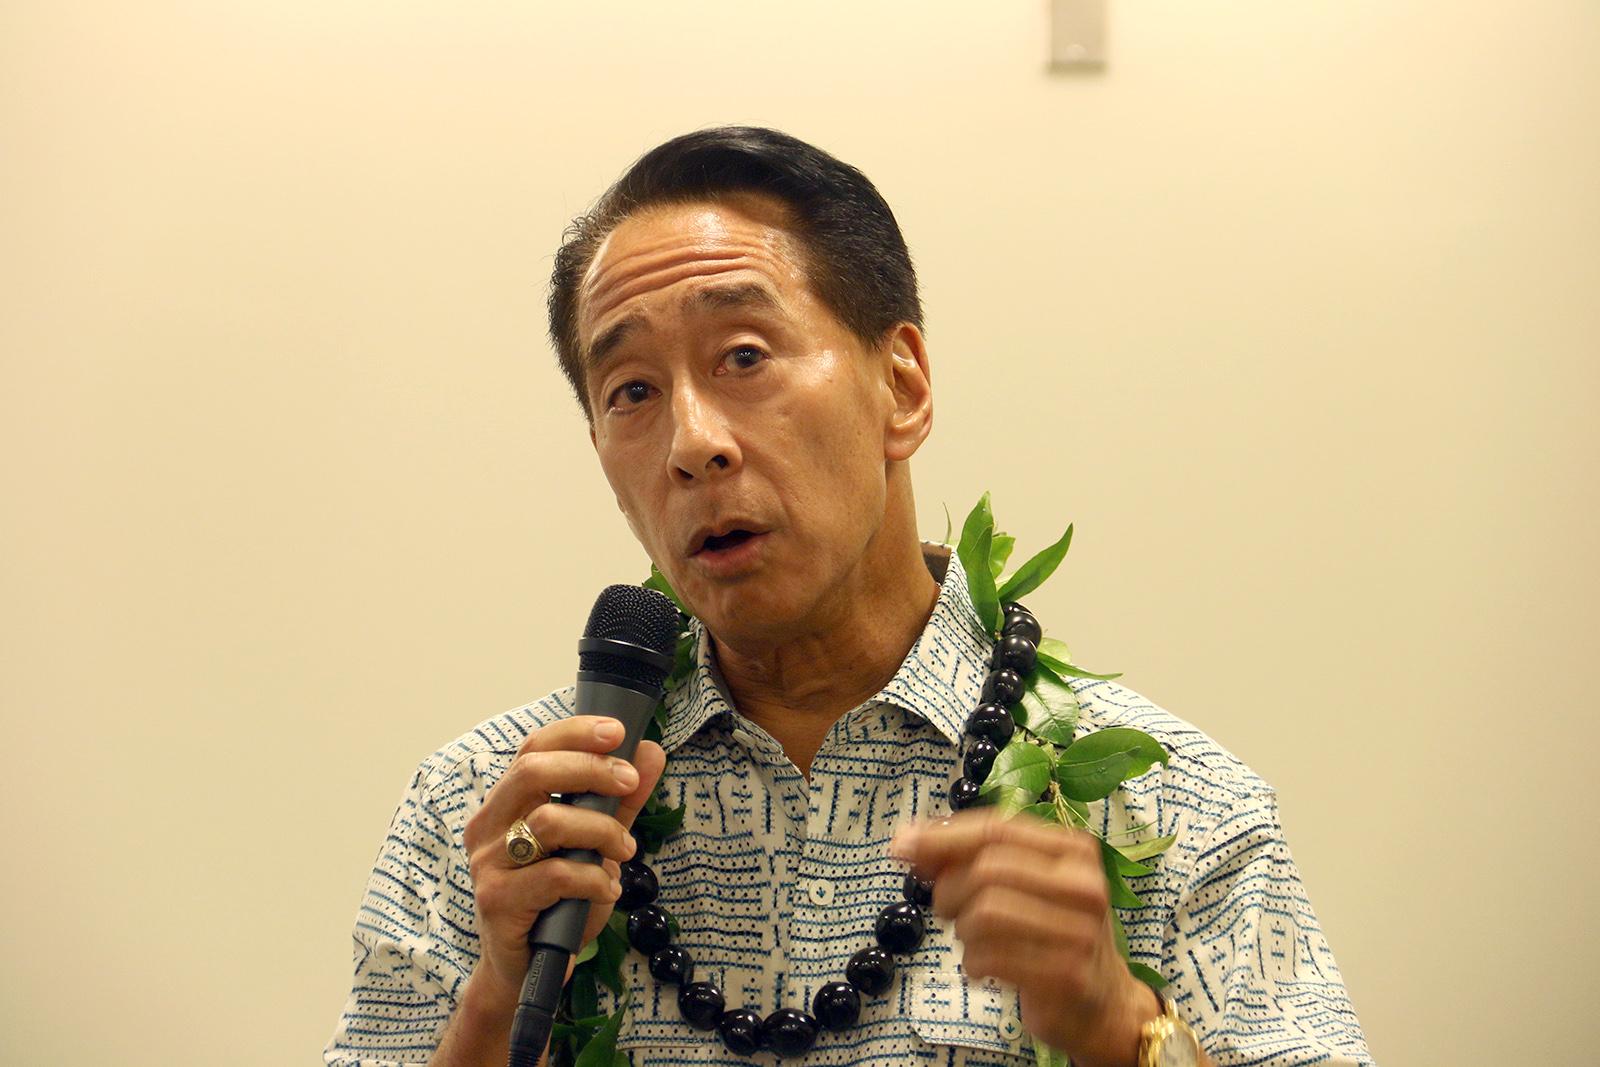 Dr. Franklin Kudo Accounting professor at UH West O'ahu